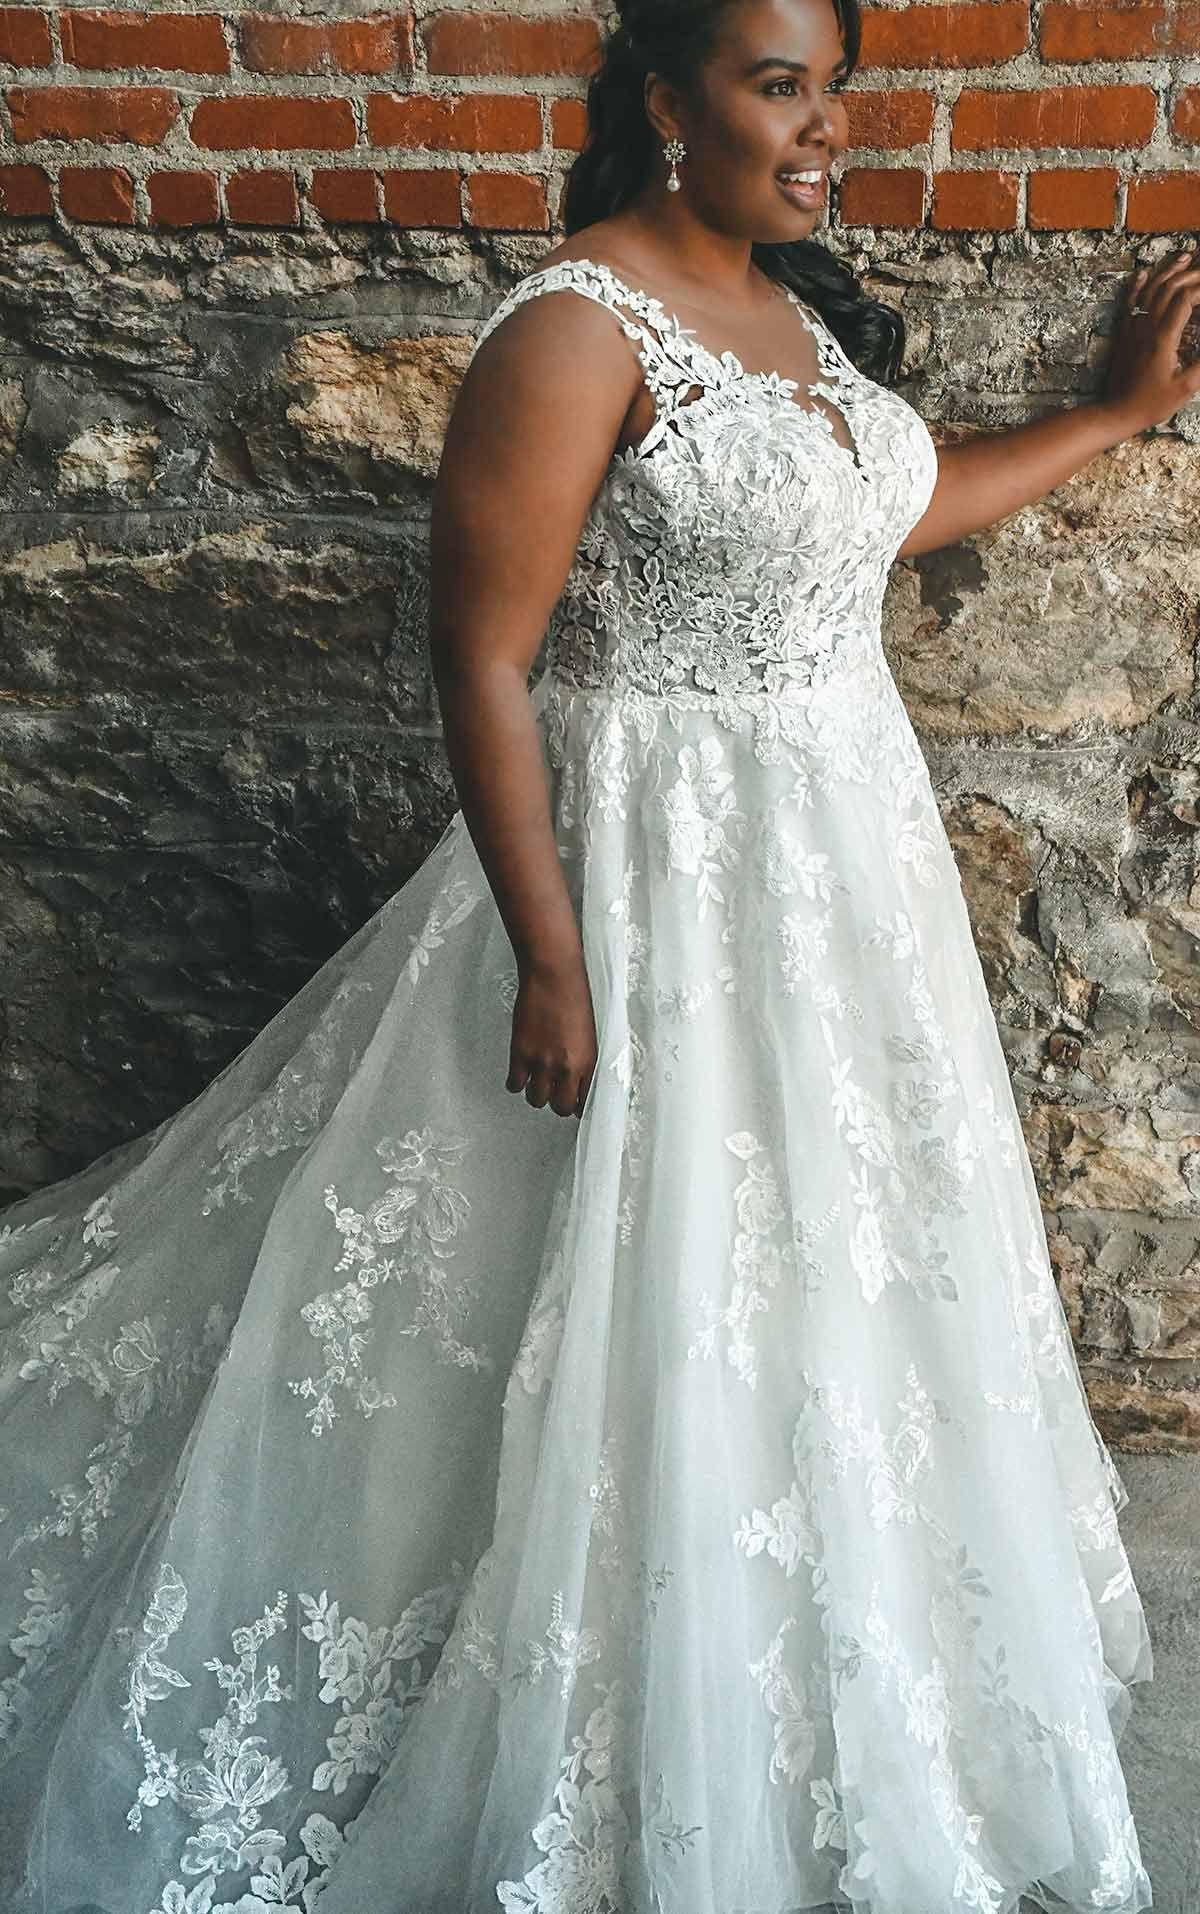 Michelle S Bridal Tuxedo Urbana Il In 2021 Essense Of Australia Wedding Dresses Wedding Dresses Plus Size Wedding [ 1914 x 1200 Pixel ]